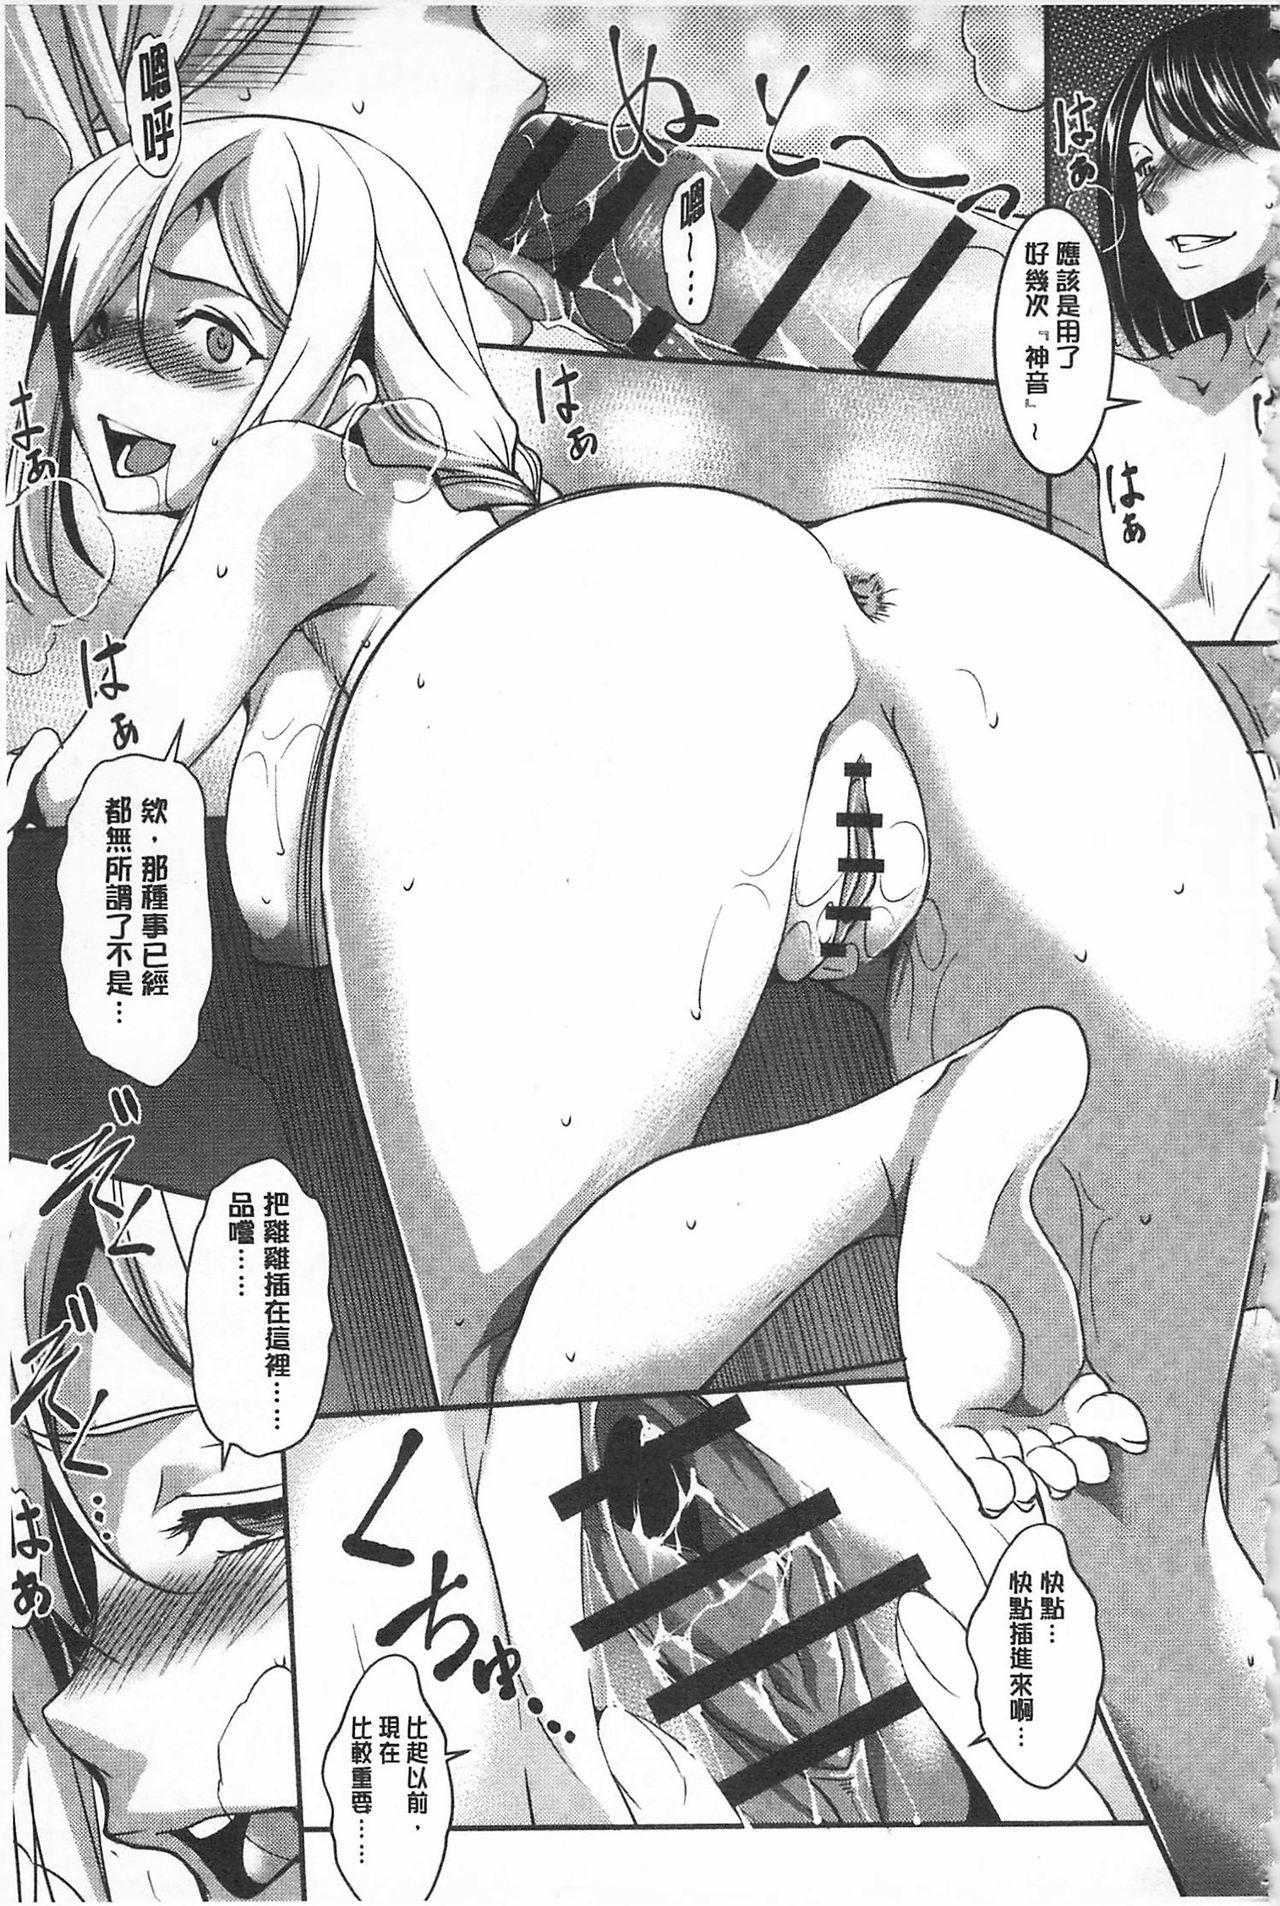 [Amano Kazumi] Seida Inyou -Seijo no Katachi Shita Intou- | 聖墮陰陽 -聖女的容貌與淫蕩- [Chinese] 58